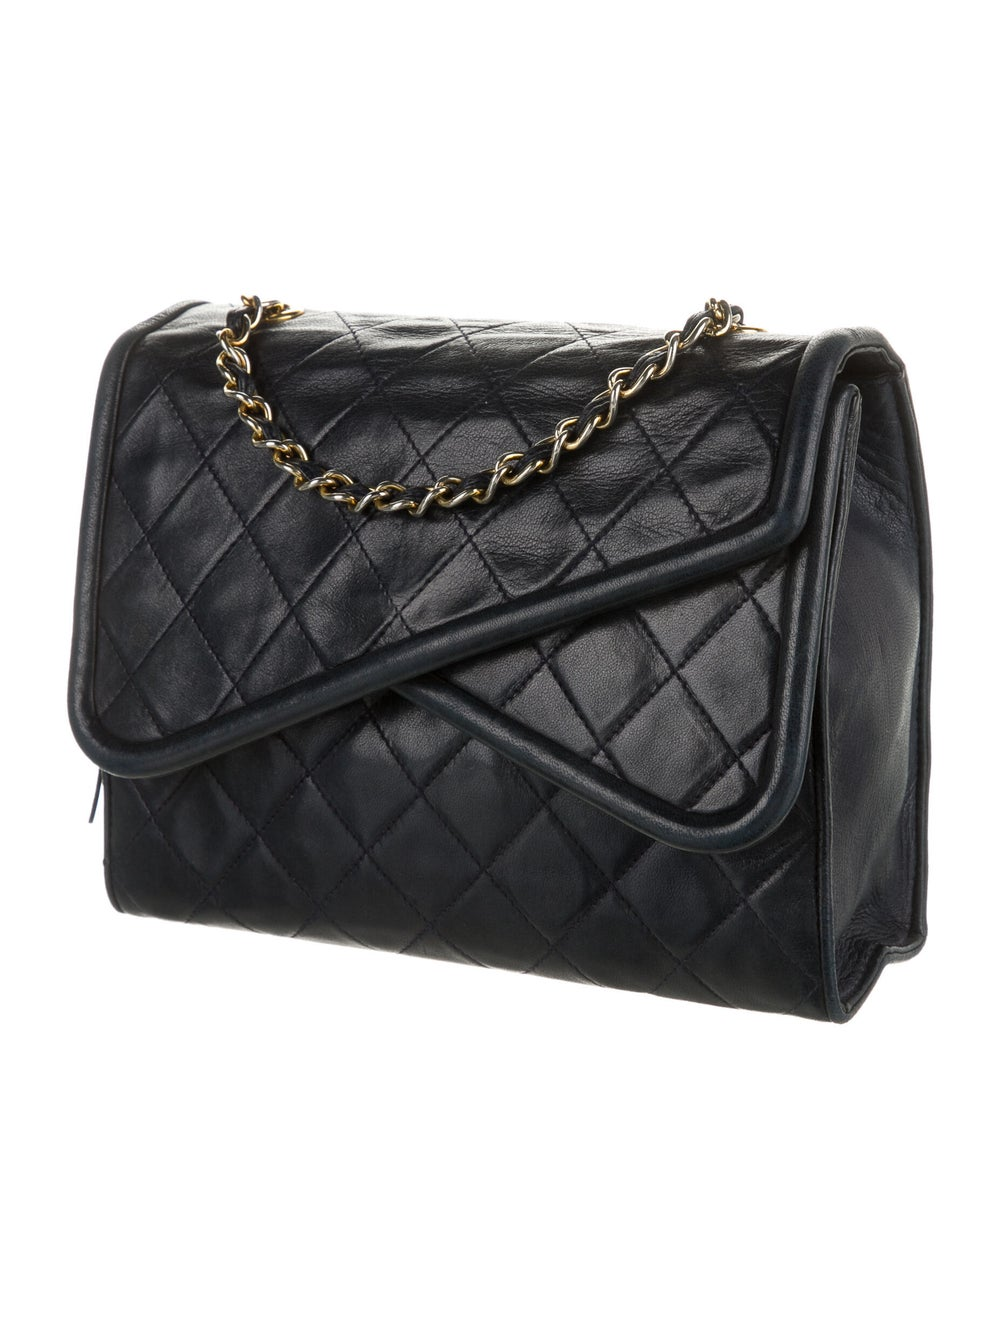 Chanel Vintage Mini Quilted Flap Bag Blue - image 3